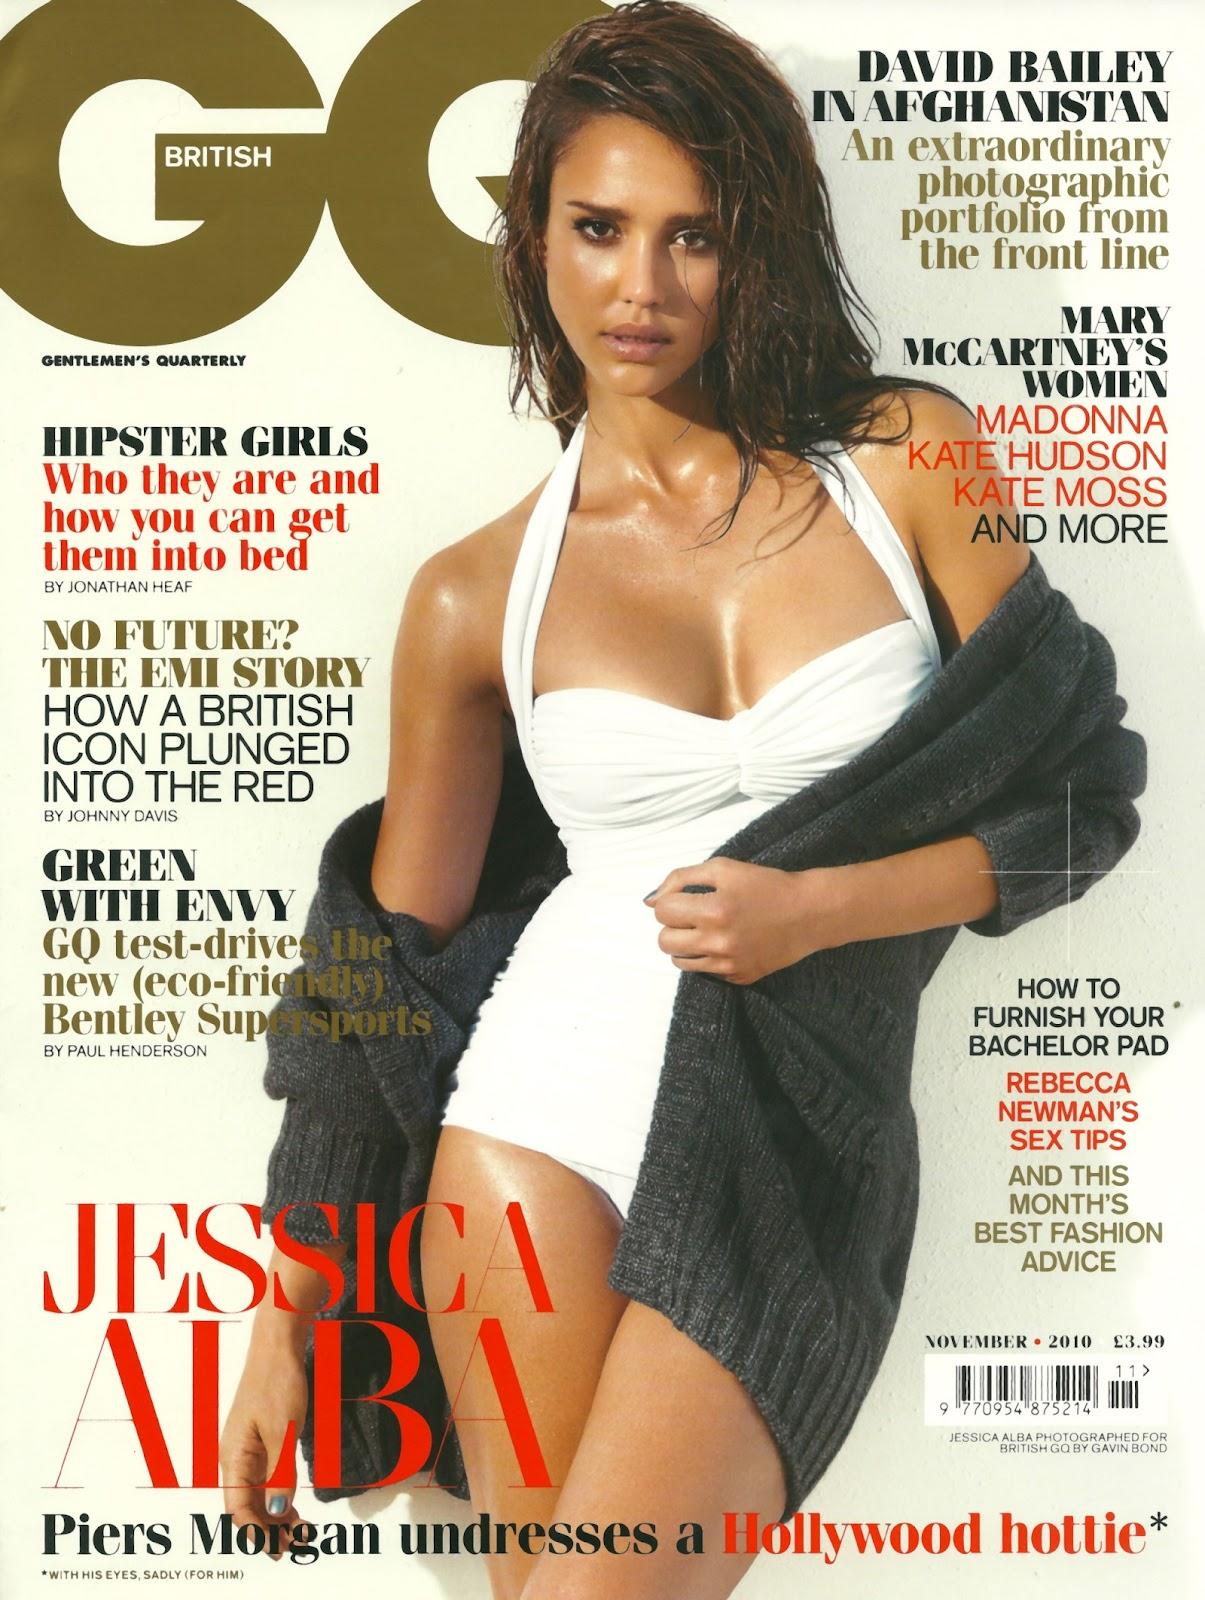 http://4.bp.blogspot.com/-lFeSb68KBL4/T-jQhFUaE9I/AAAAAAAAF5A/7DtgAgACW5Y/s1600/Jessica+Alba+GQ+UK+Magazine+November+2010+02.jpg